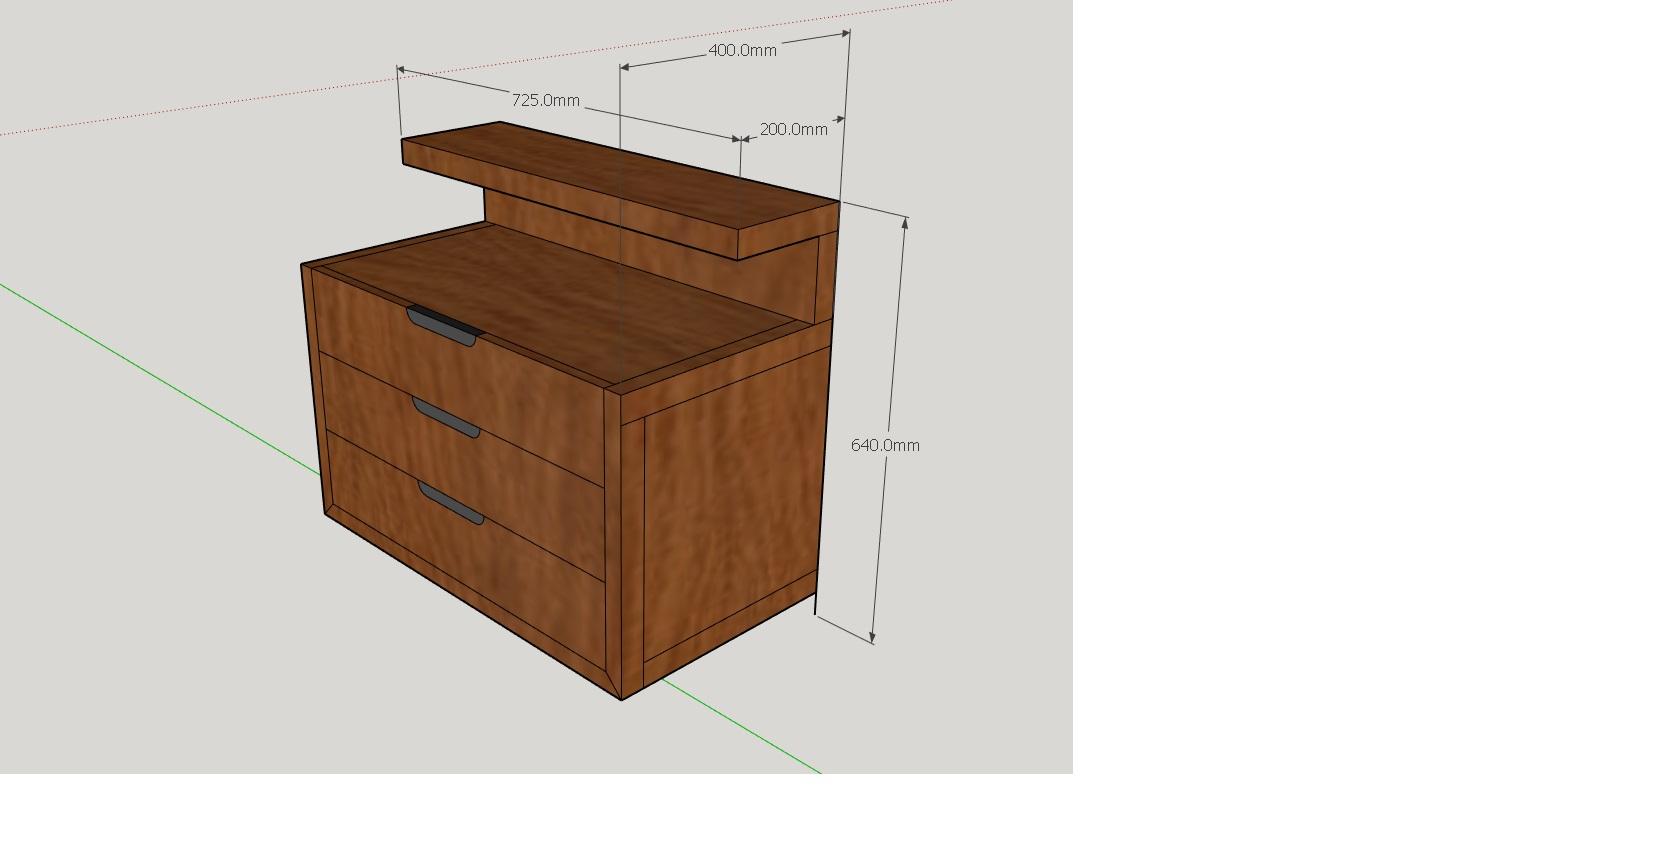 stephen claudi bedside table design.jpg